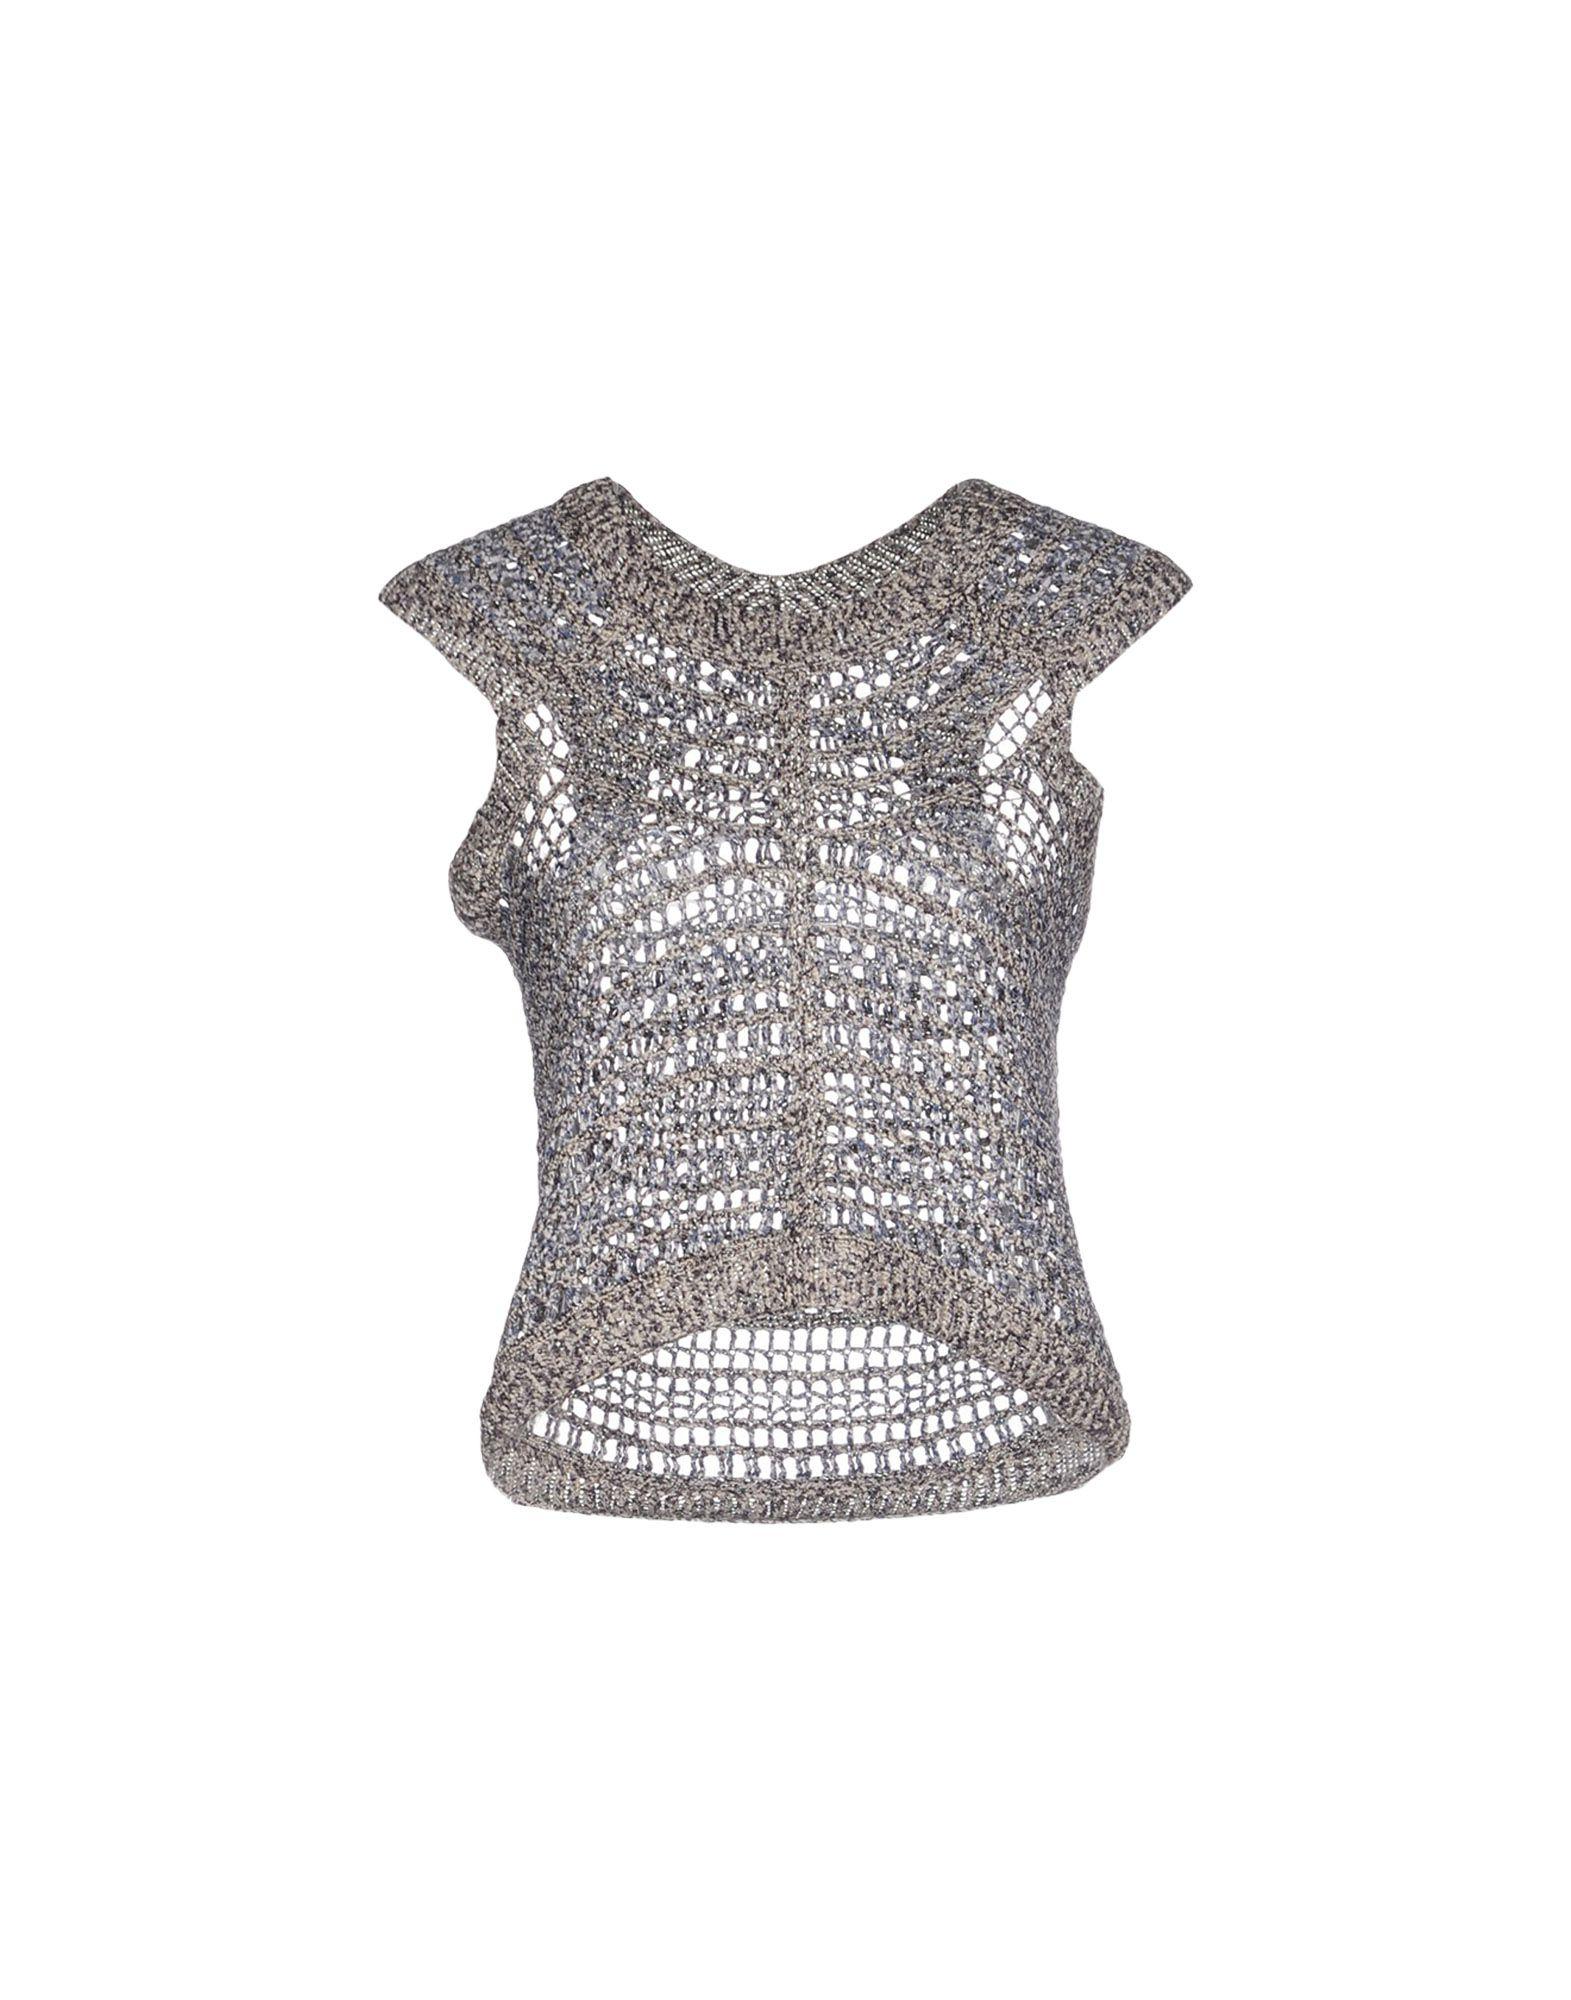 THEYSKENS' THEORY Sweater in Grey